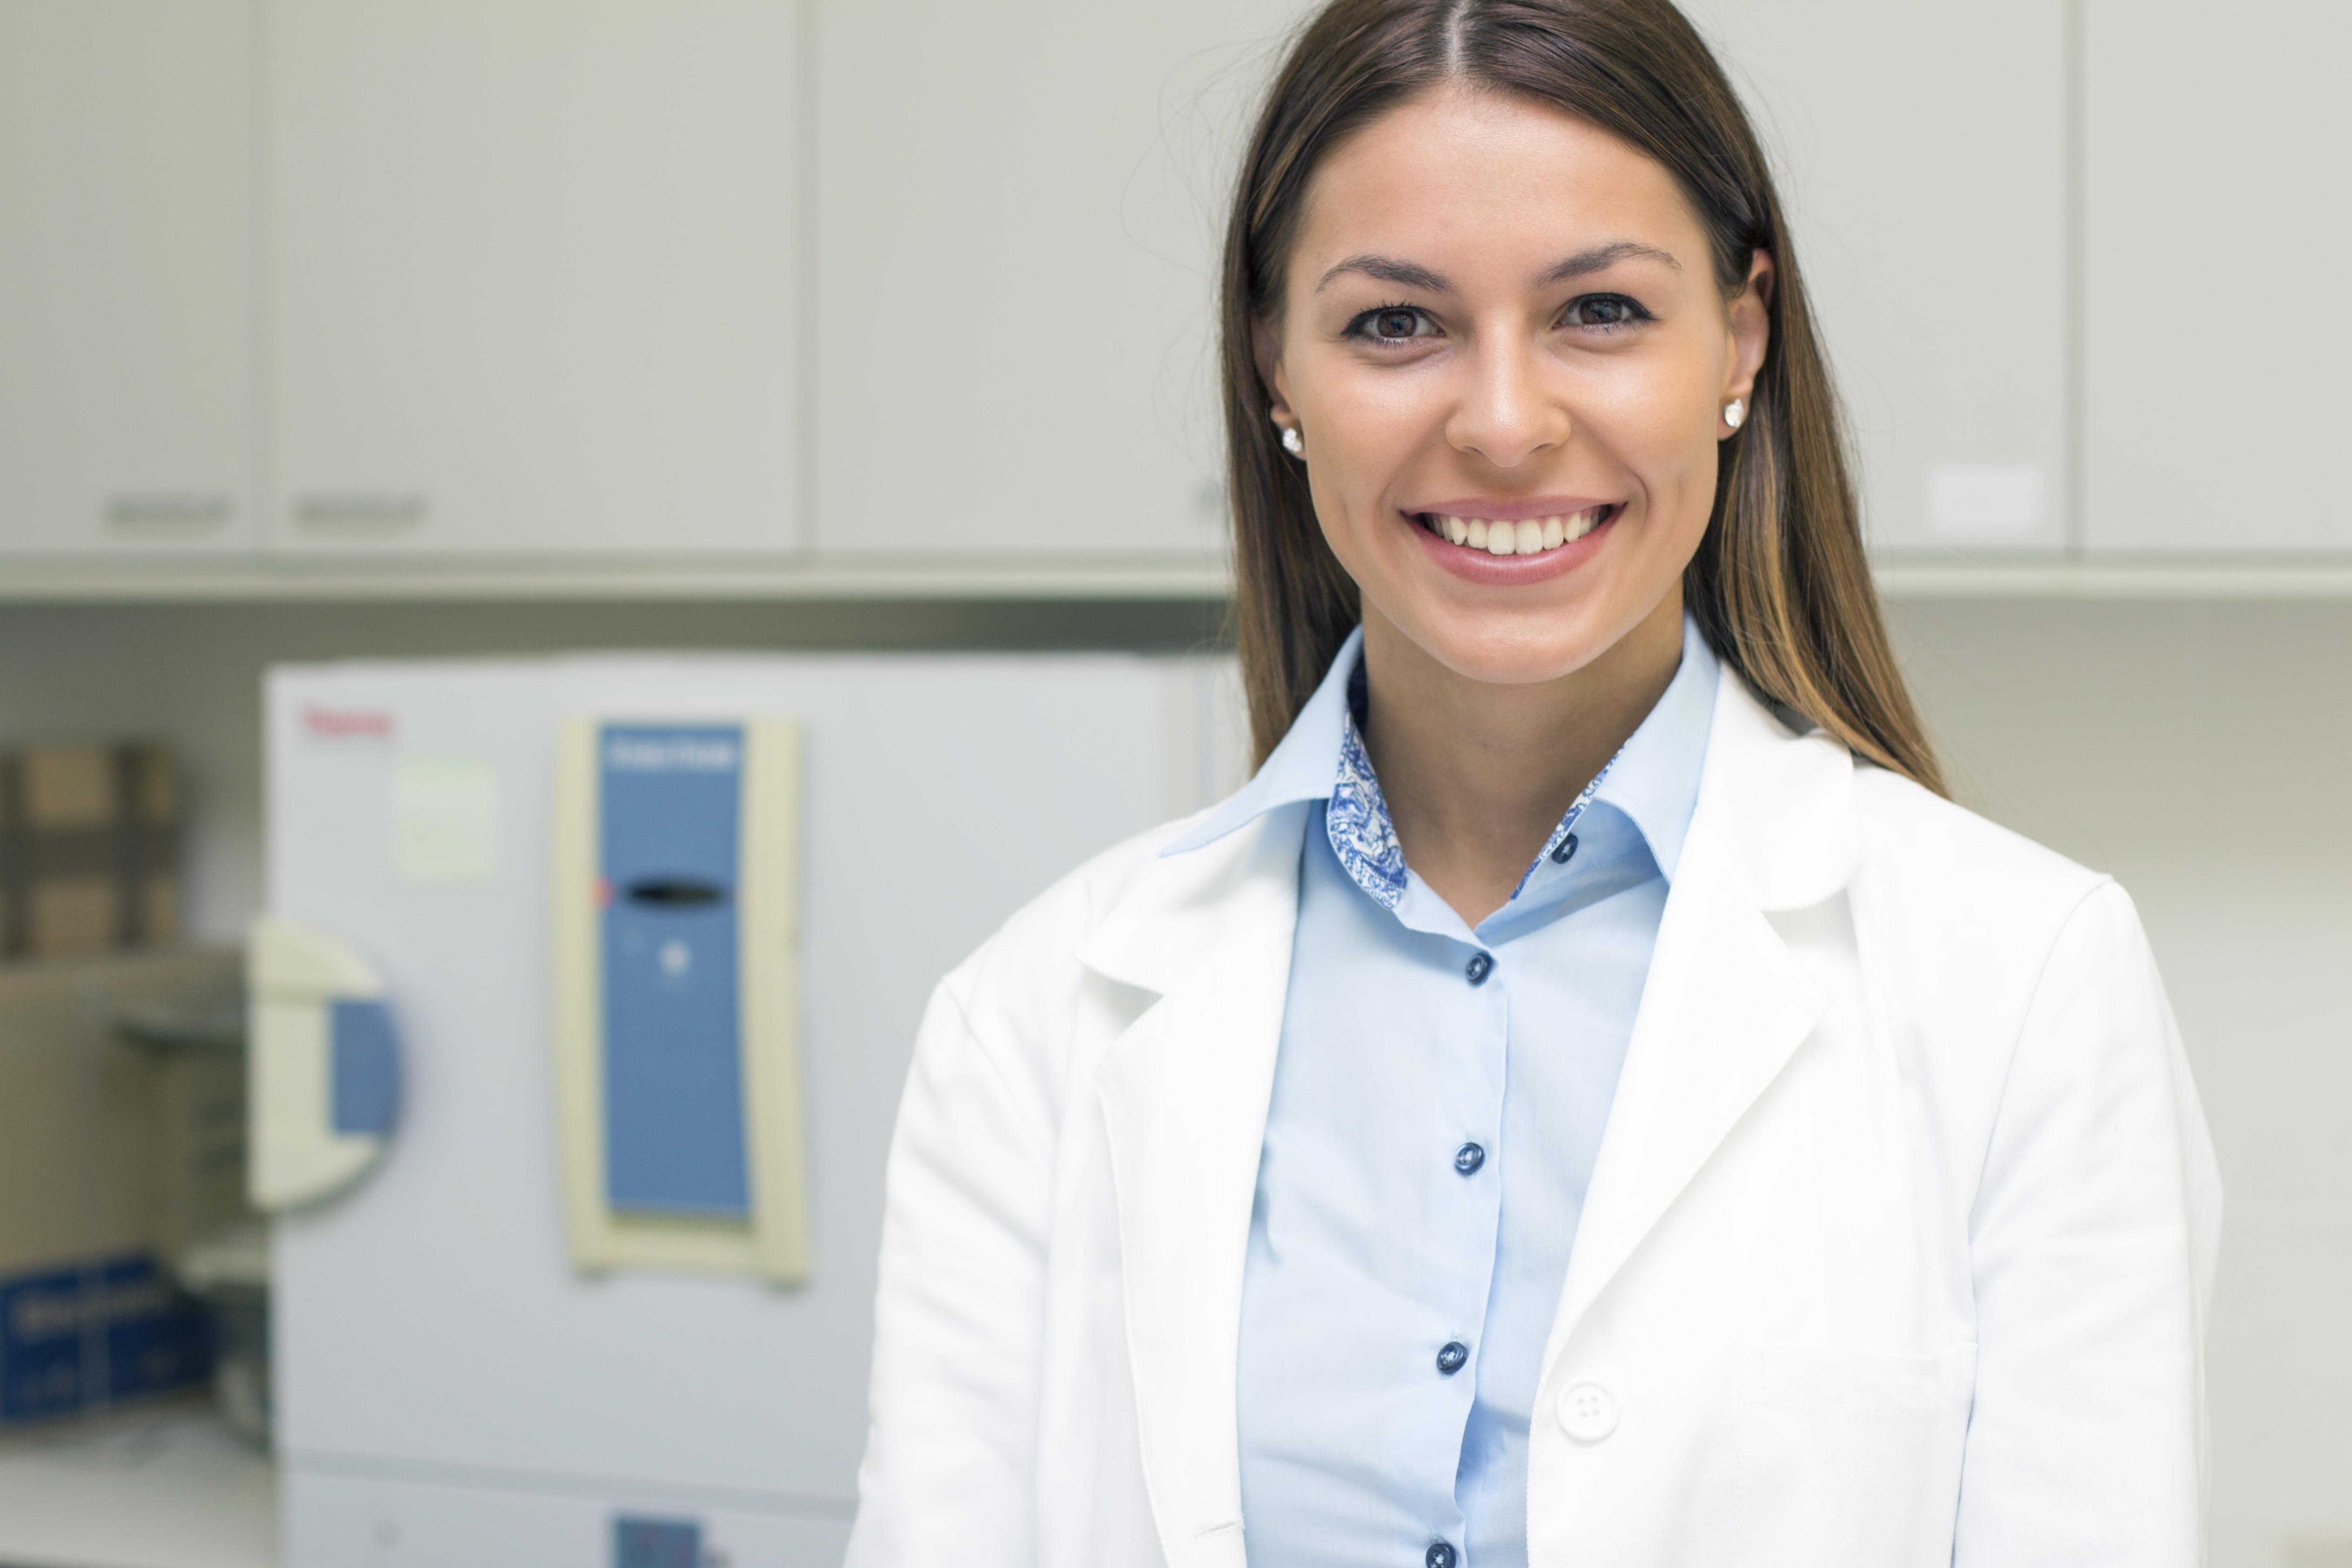 scientist-female-smiling-whitecoat-lab-equipment.jpg